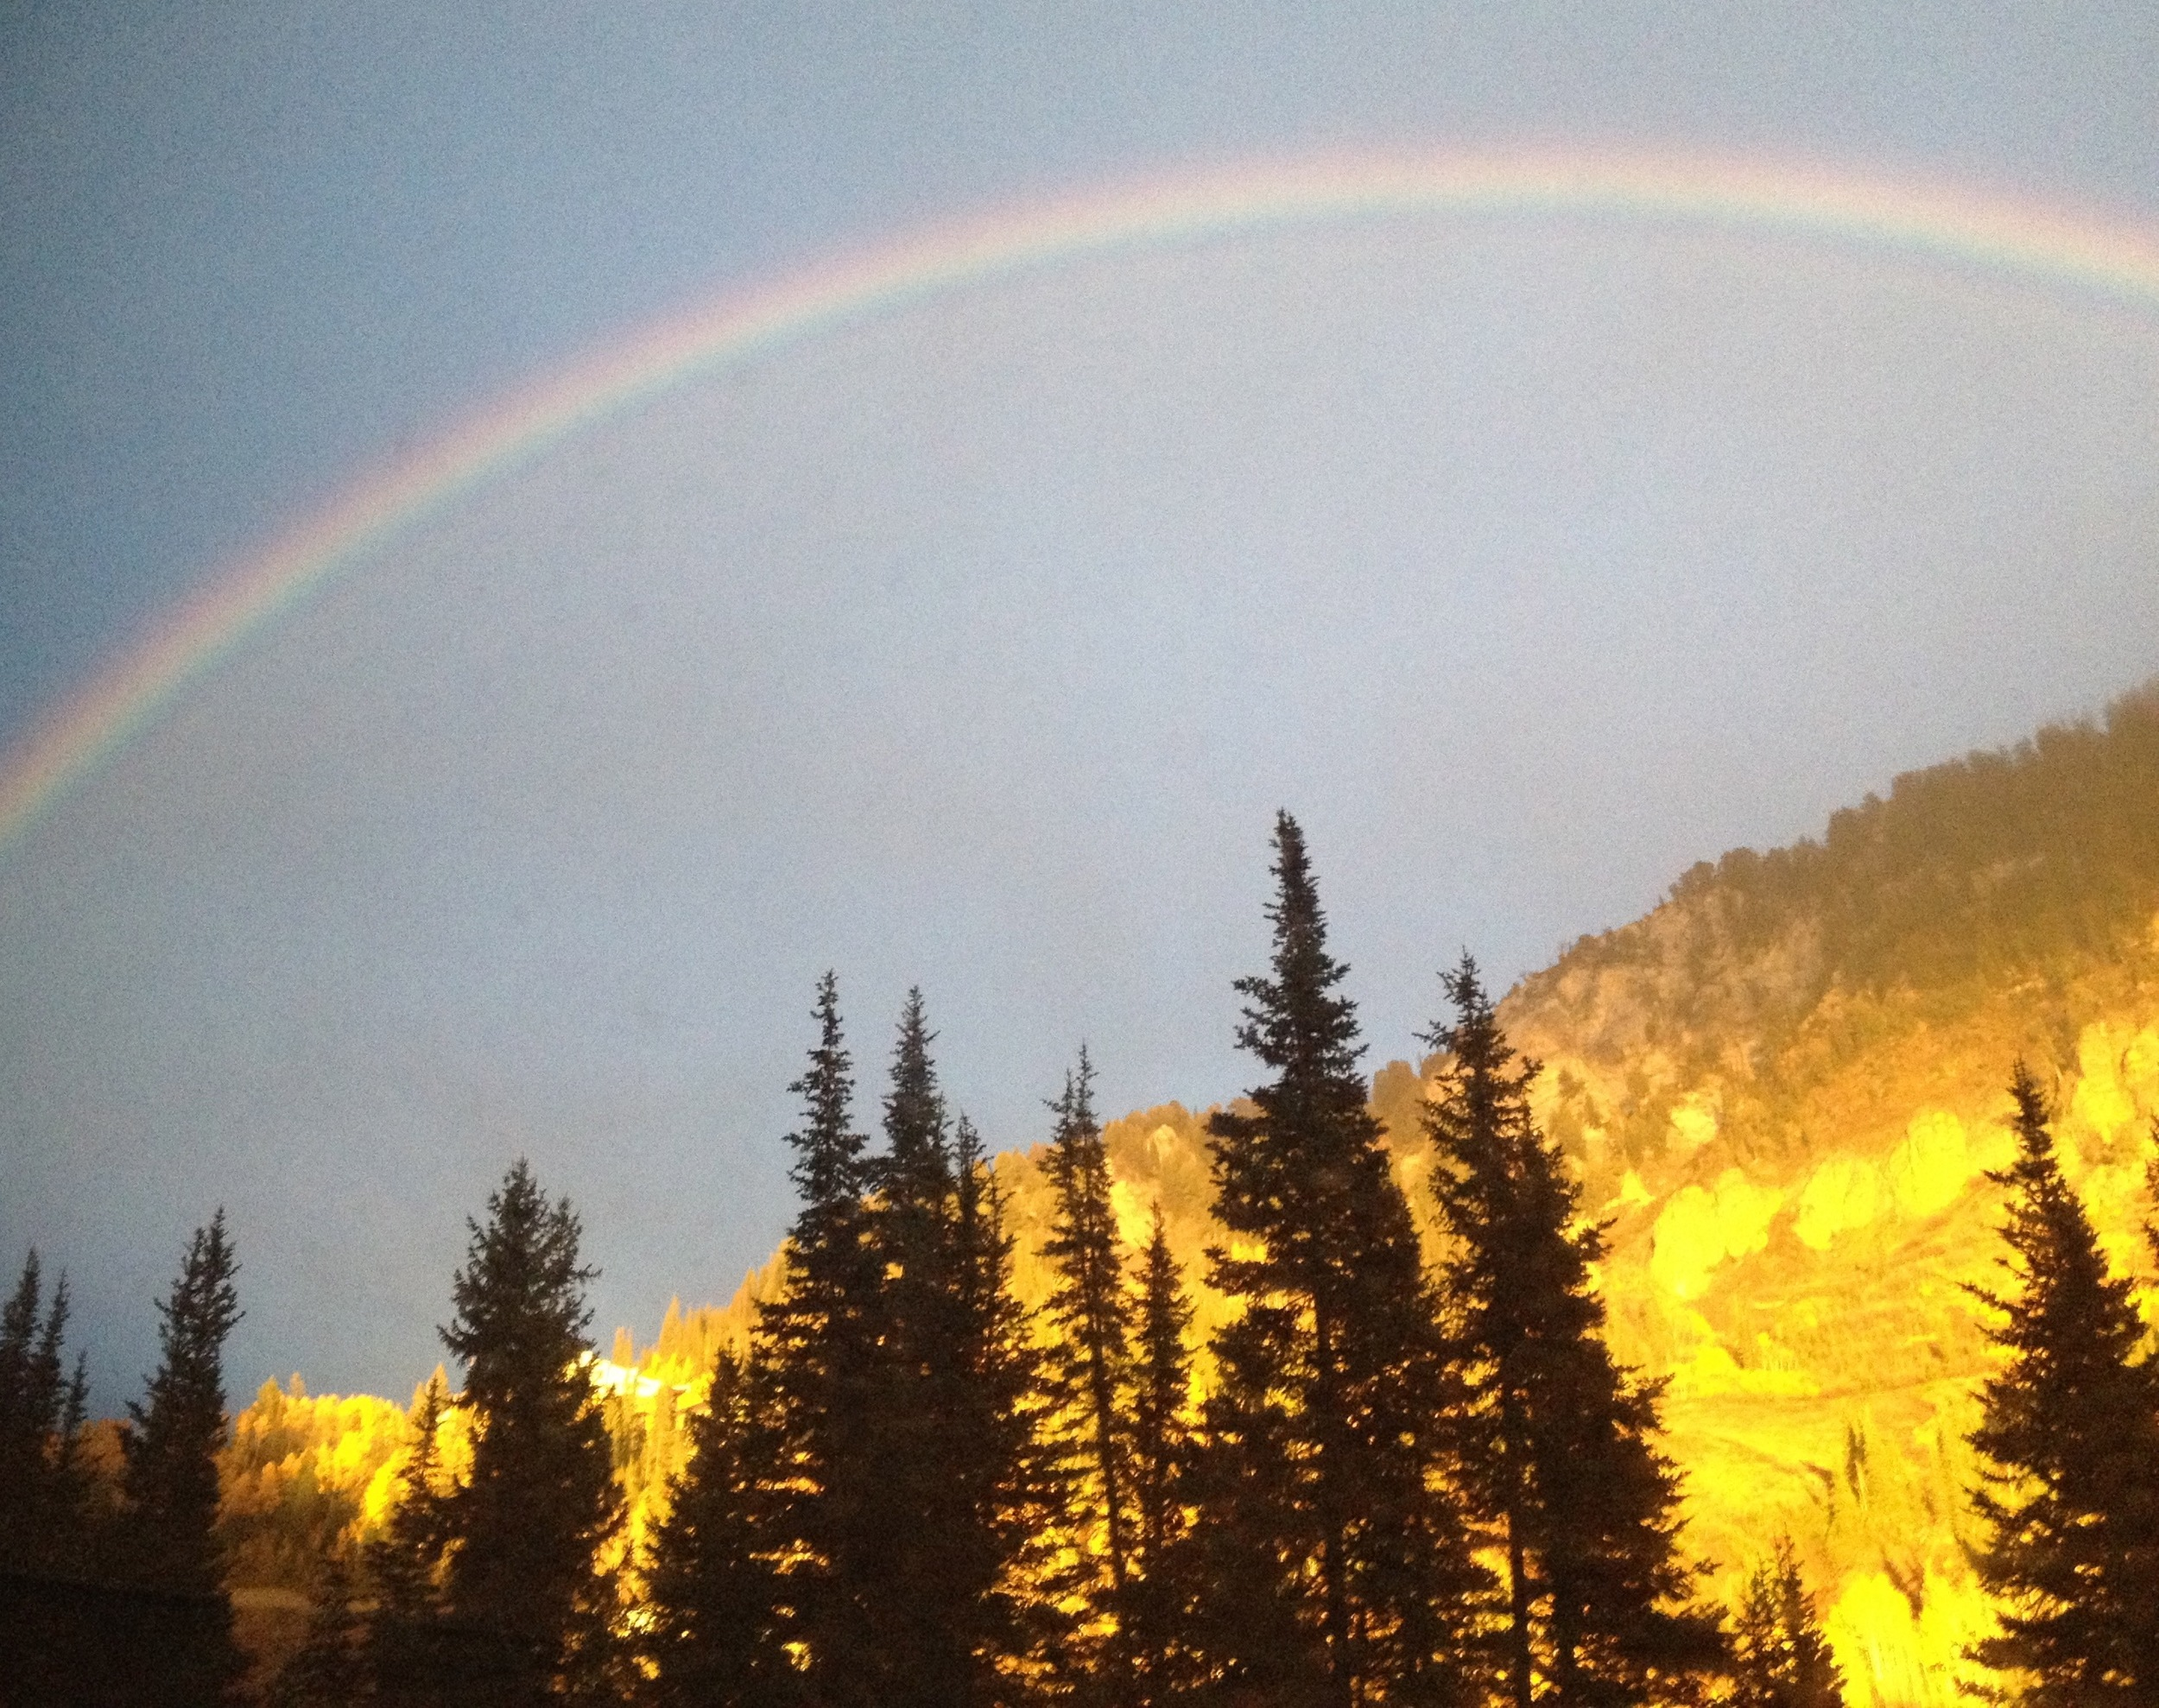 Jani McCarty Rainbow Provo UT